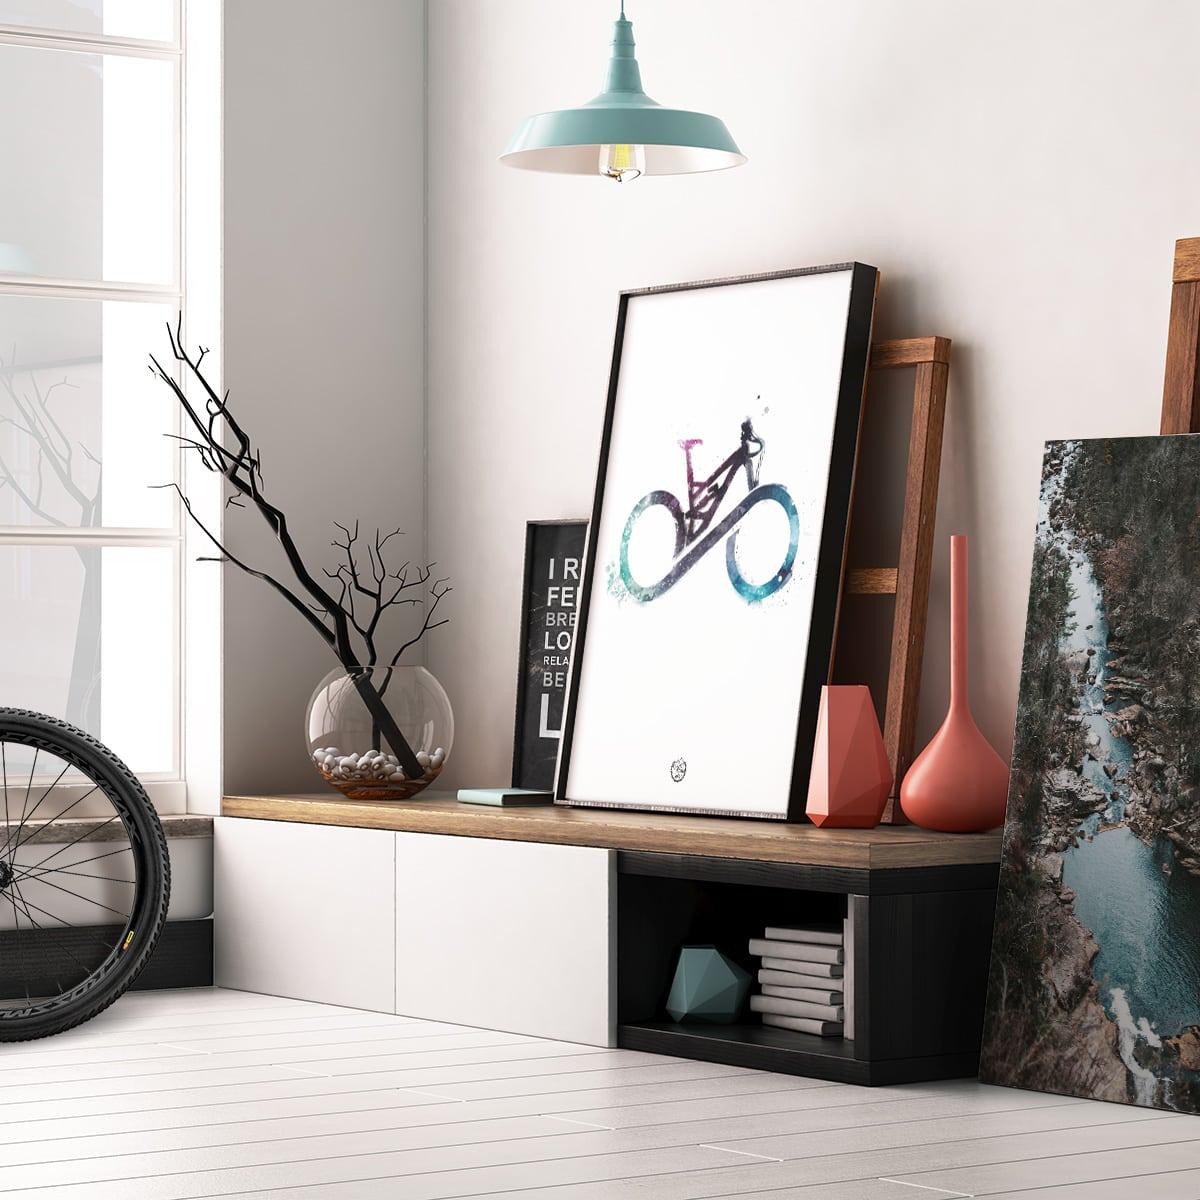 Andre MTB cykel plakater